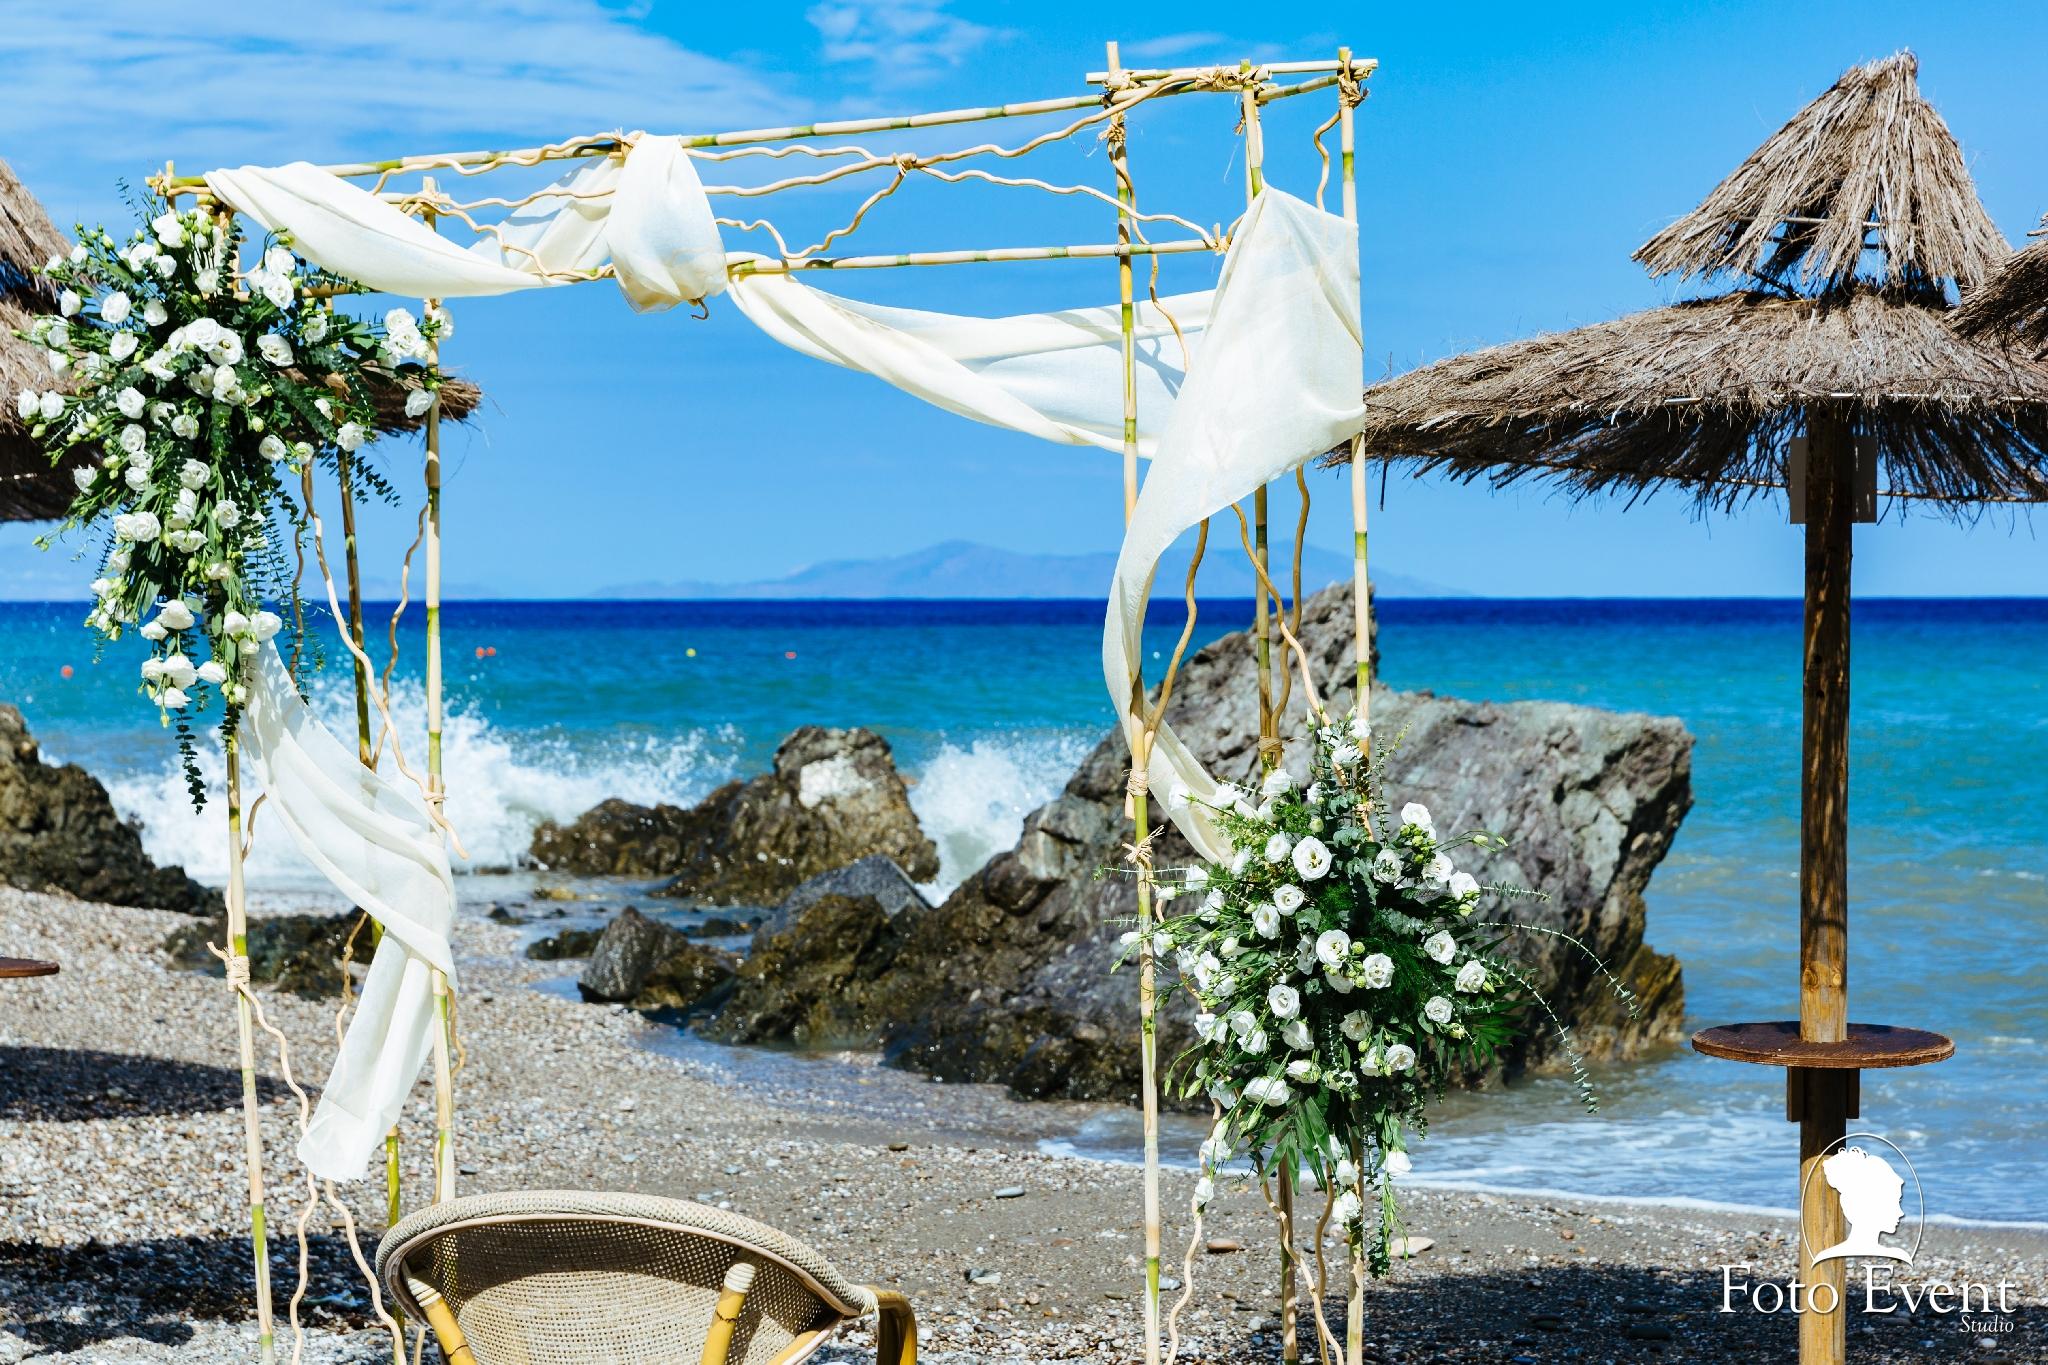 2018-09-25 Matrimonio Jessi e Simon Milligan 5DE 009